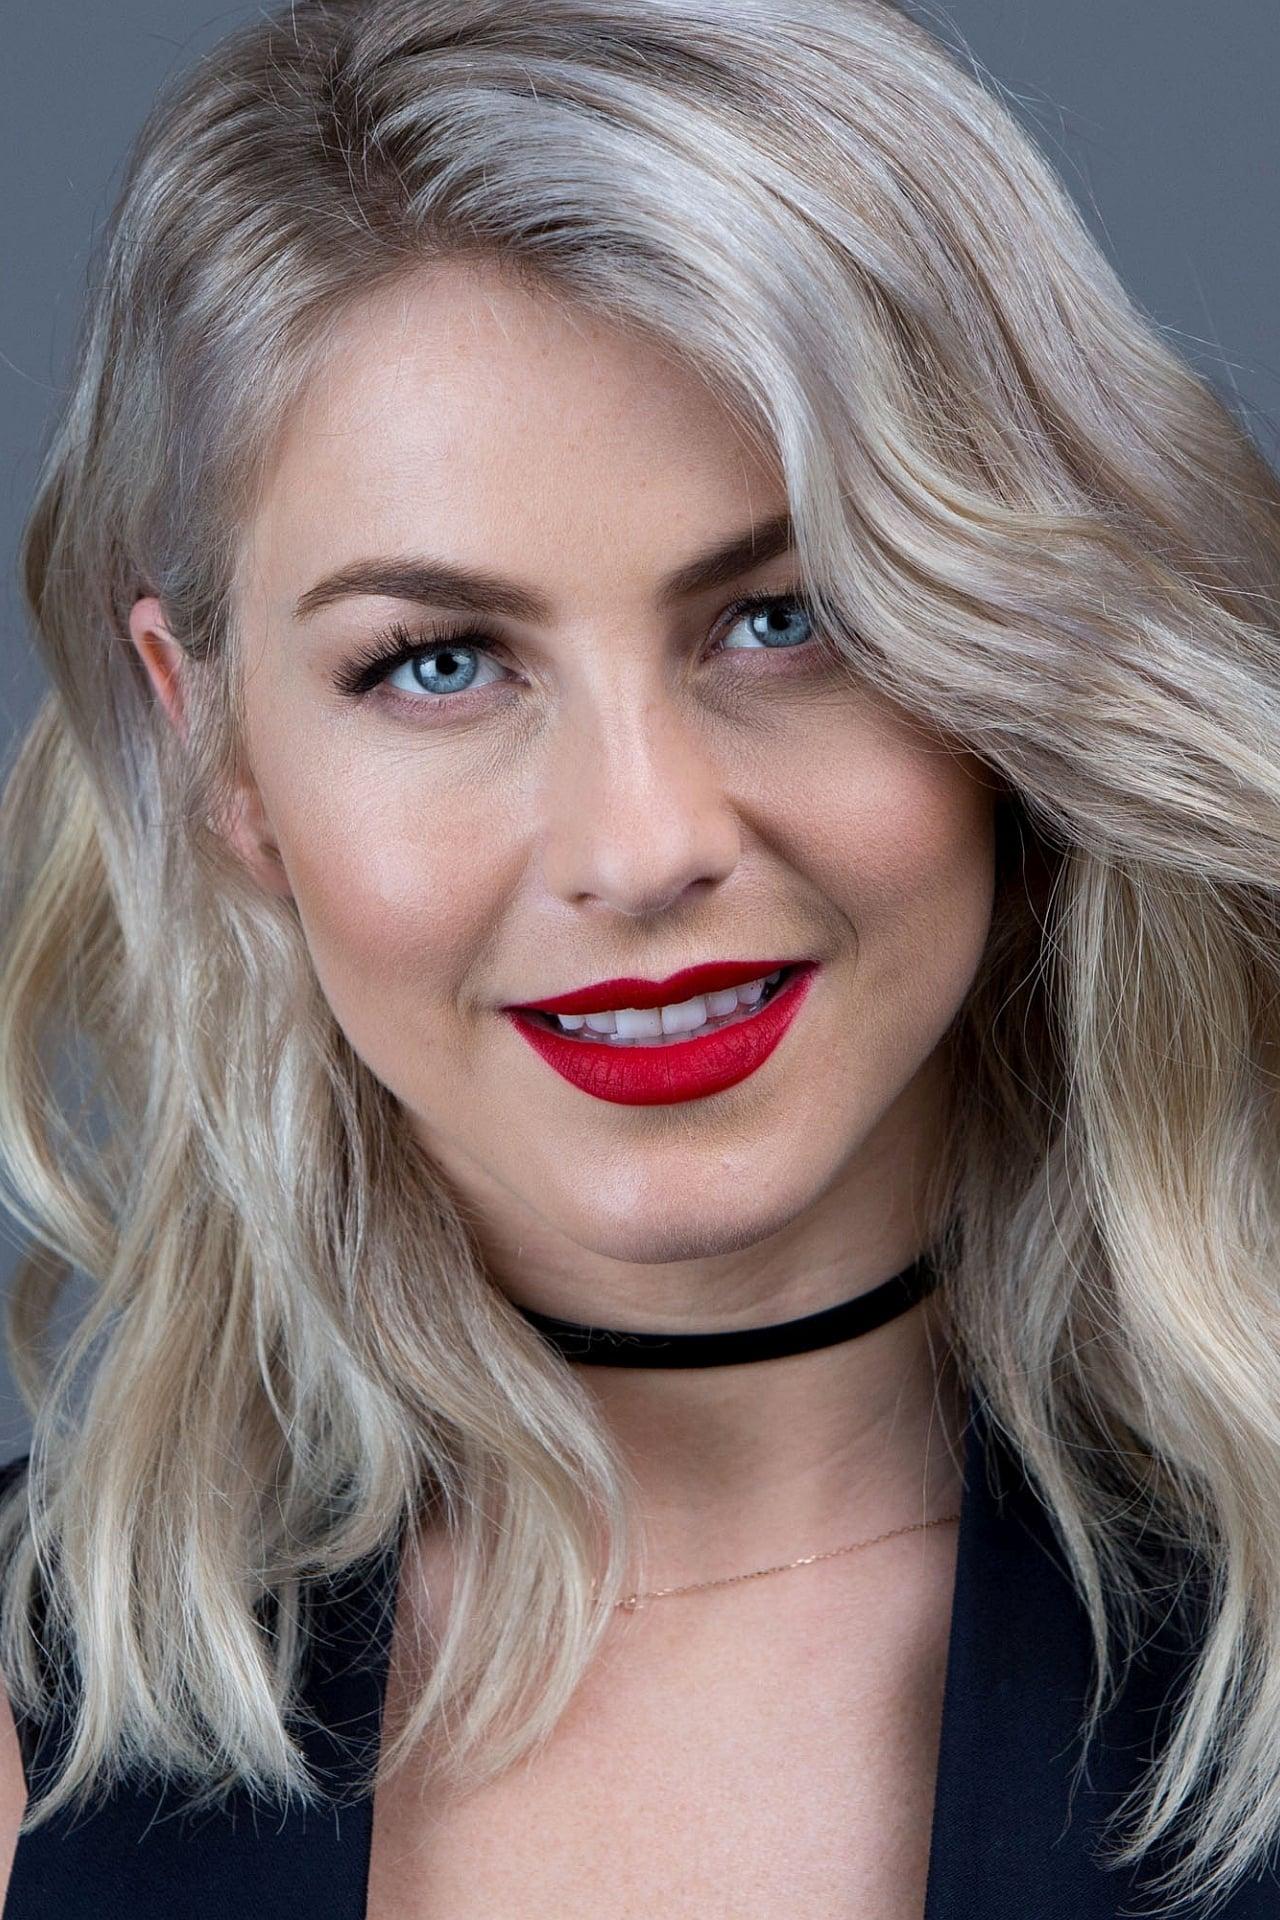 celebrity look alike dating app